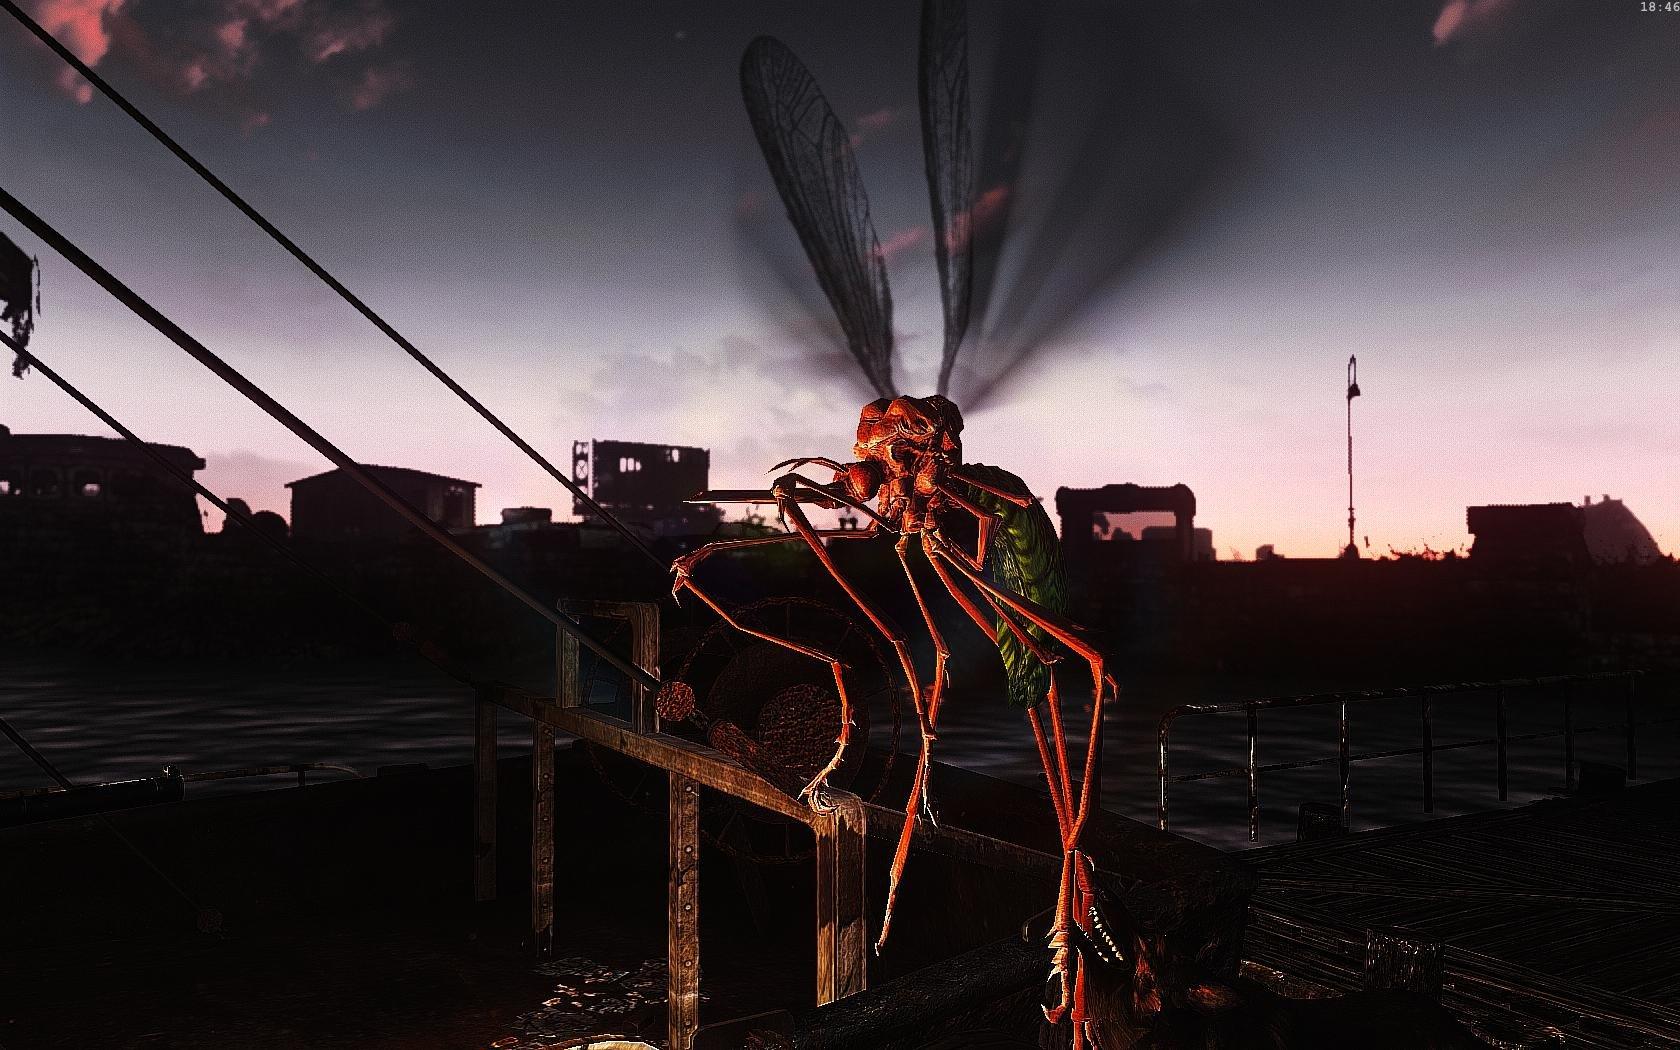 Fallout4 2019-02-05 18-46-52-76